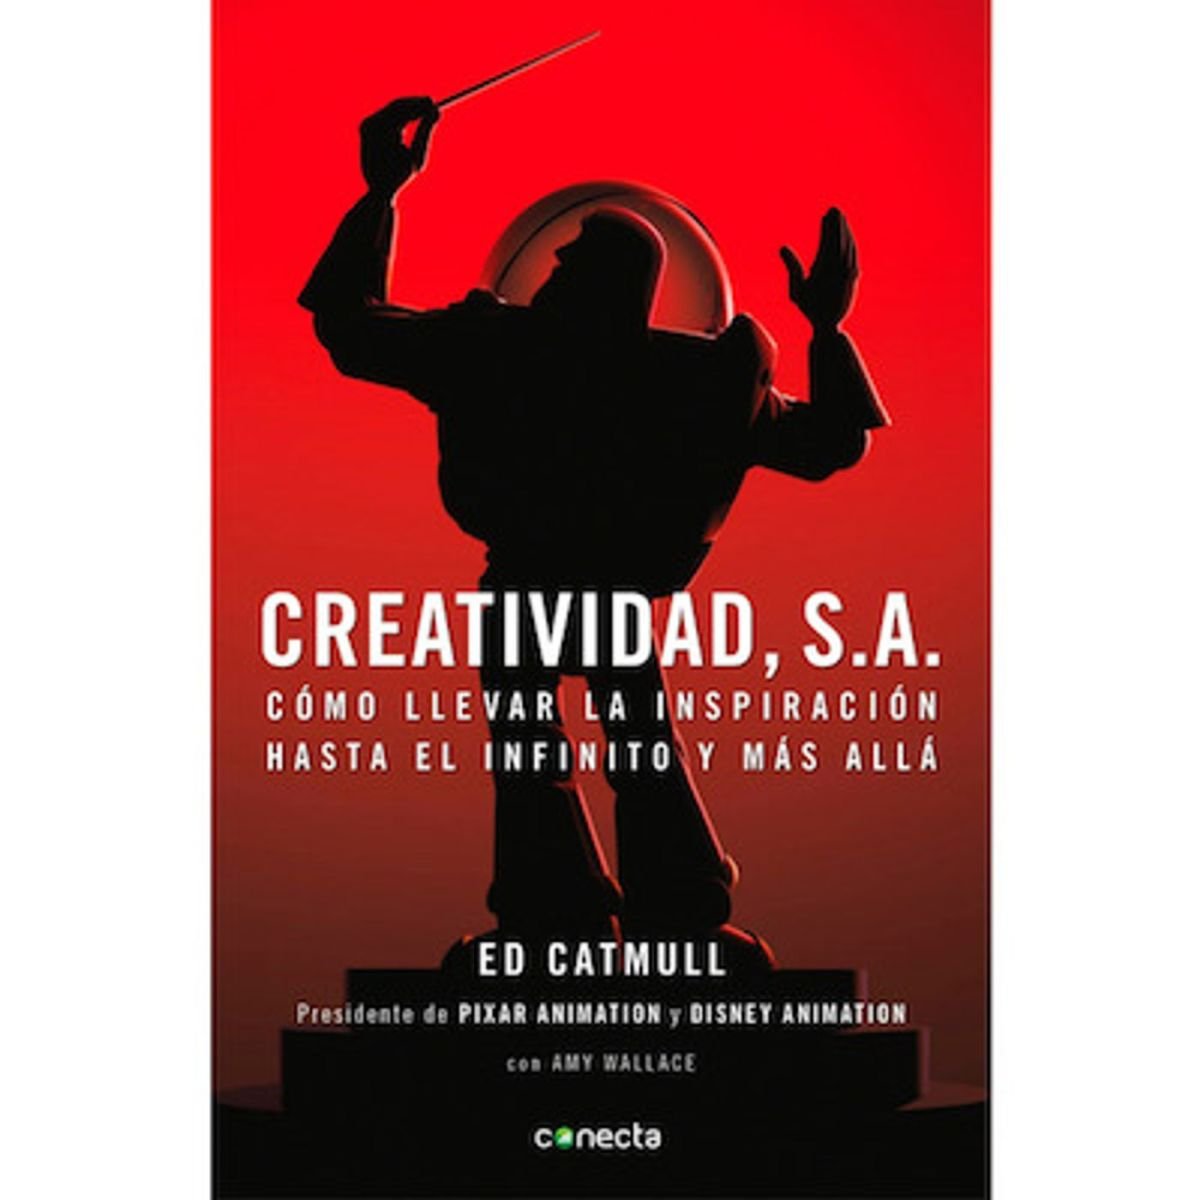 2×01 UMDL Creatividad SA